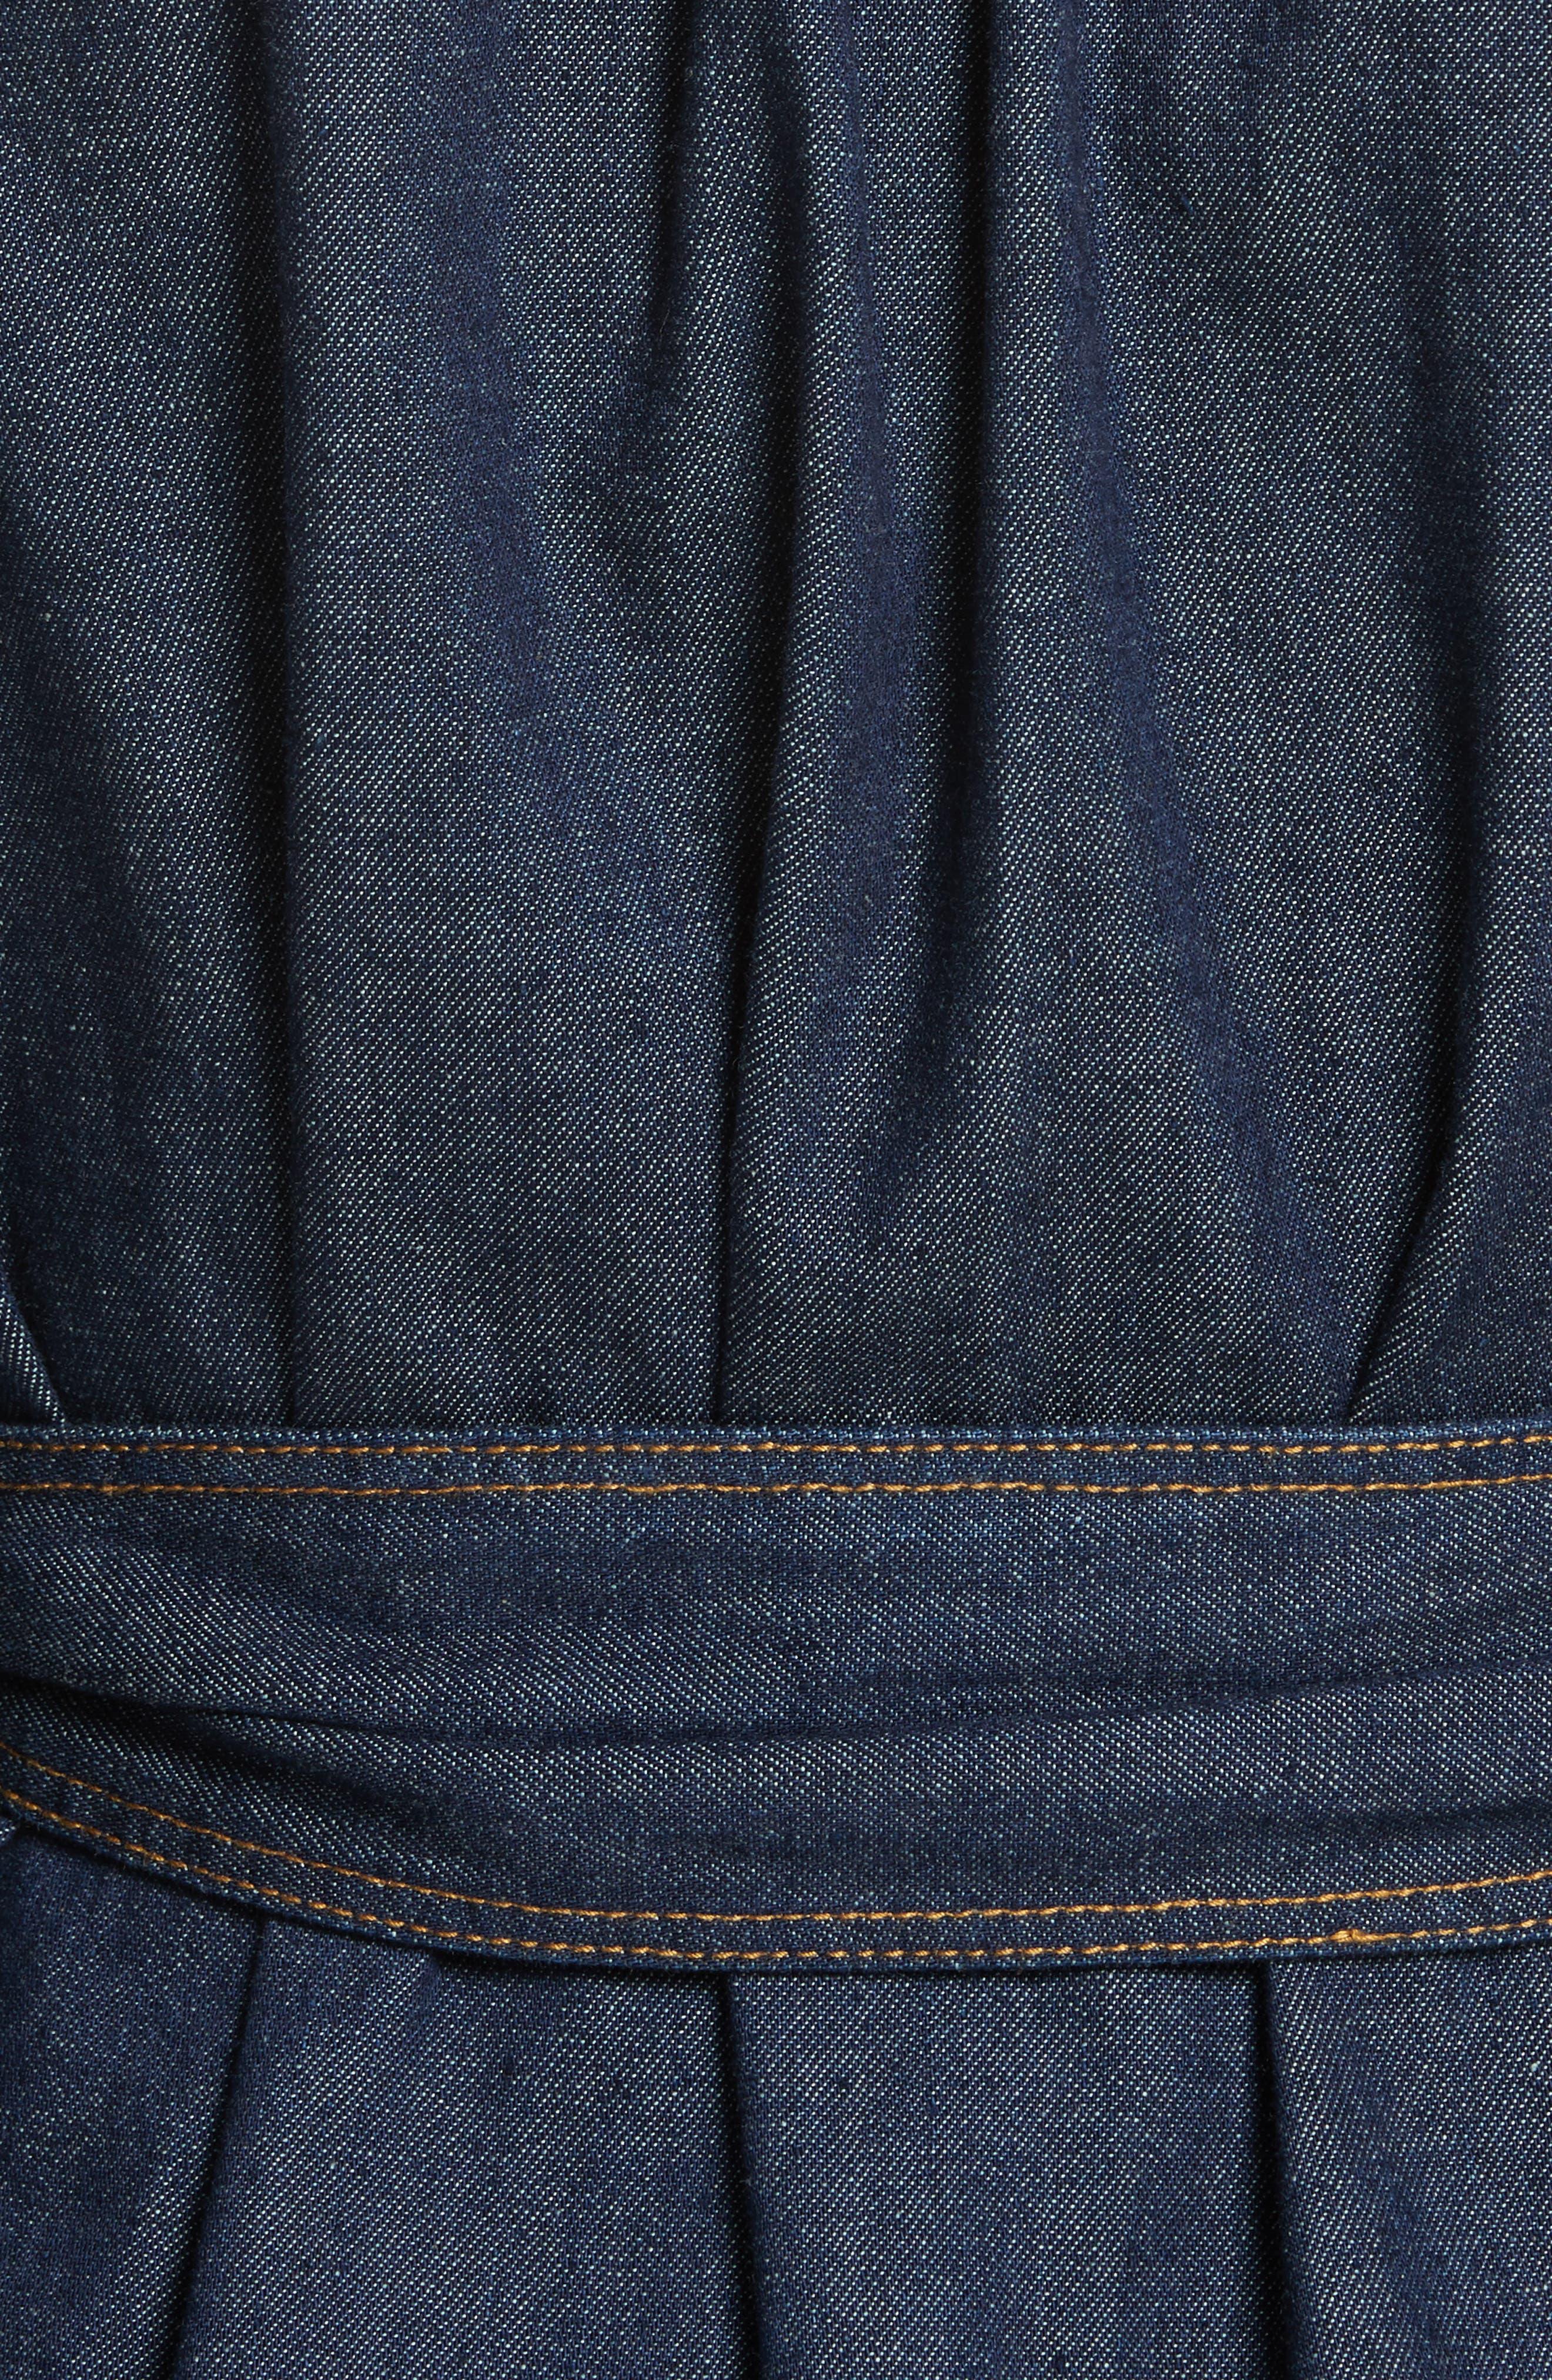 Belted Denim Dress,                             Alternate thumbnail 5, color,                             409